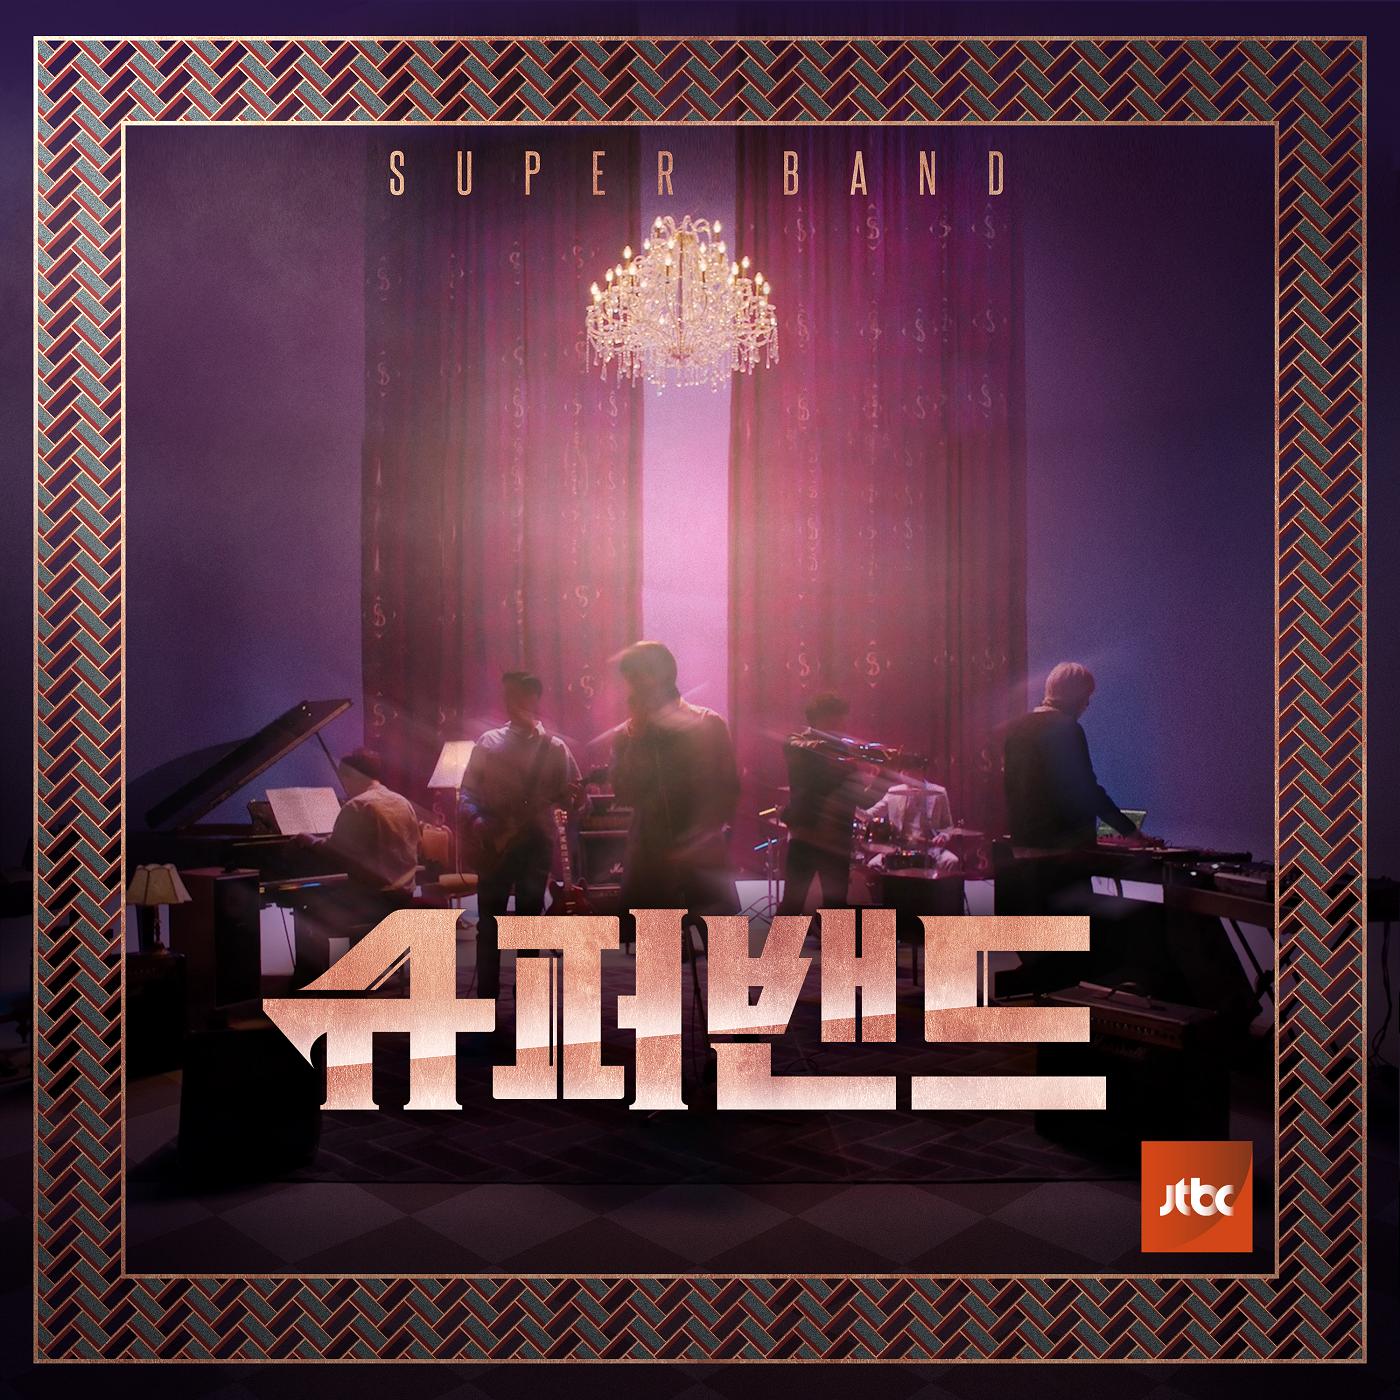 JTBC SuperBand Episode 10